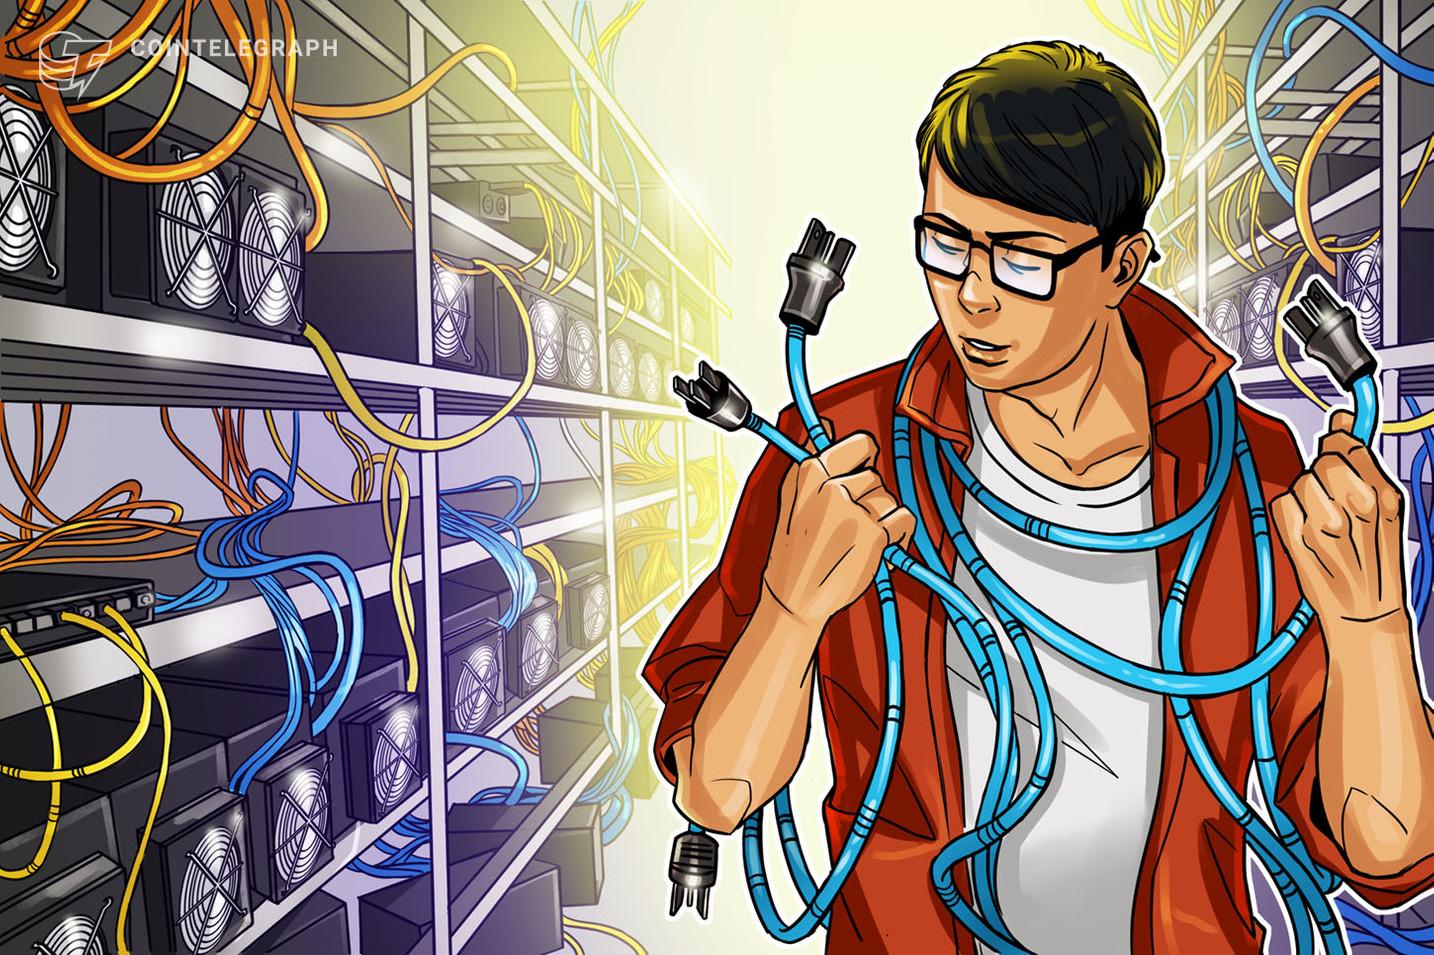 Dados indicam que o hash do Bitcoin está começando a se afastar da China